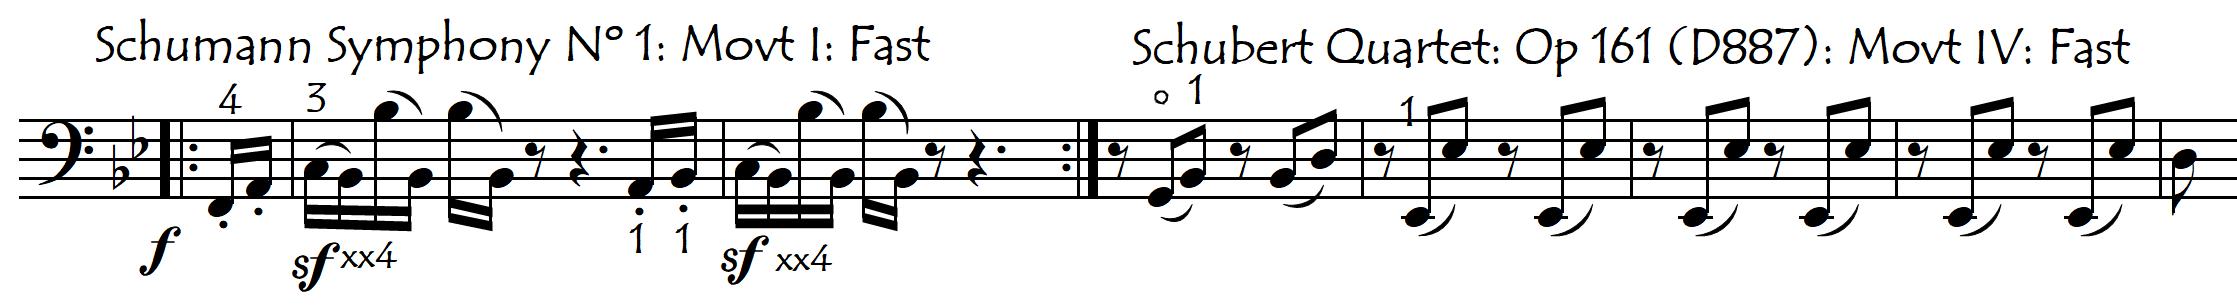 dbleextn schub scumann octaves slurred